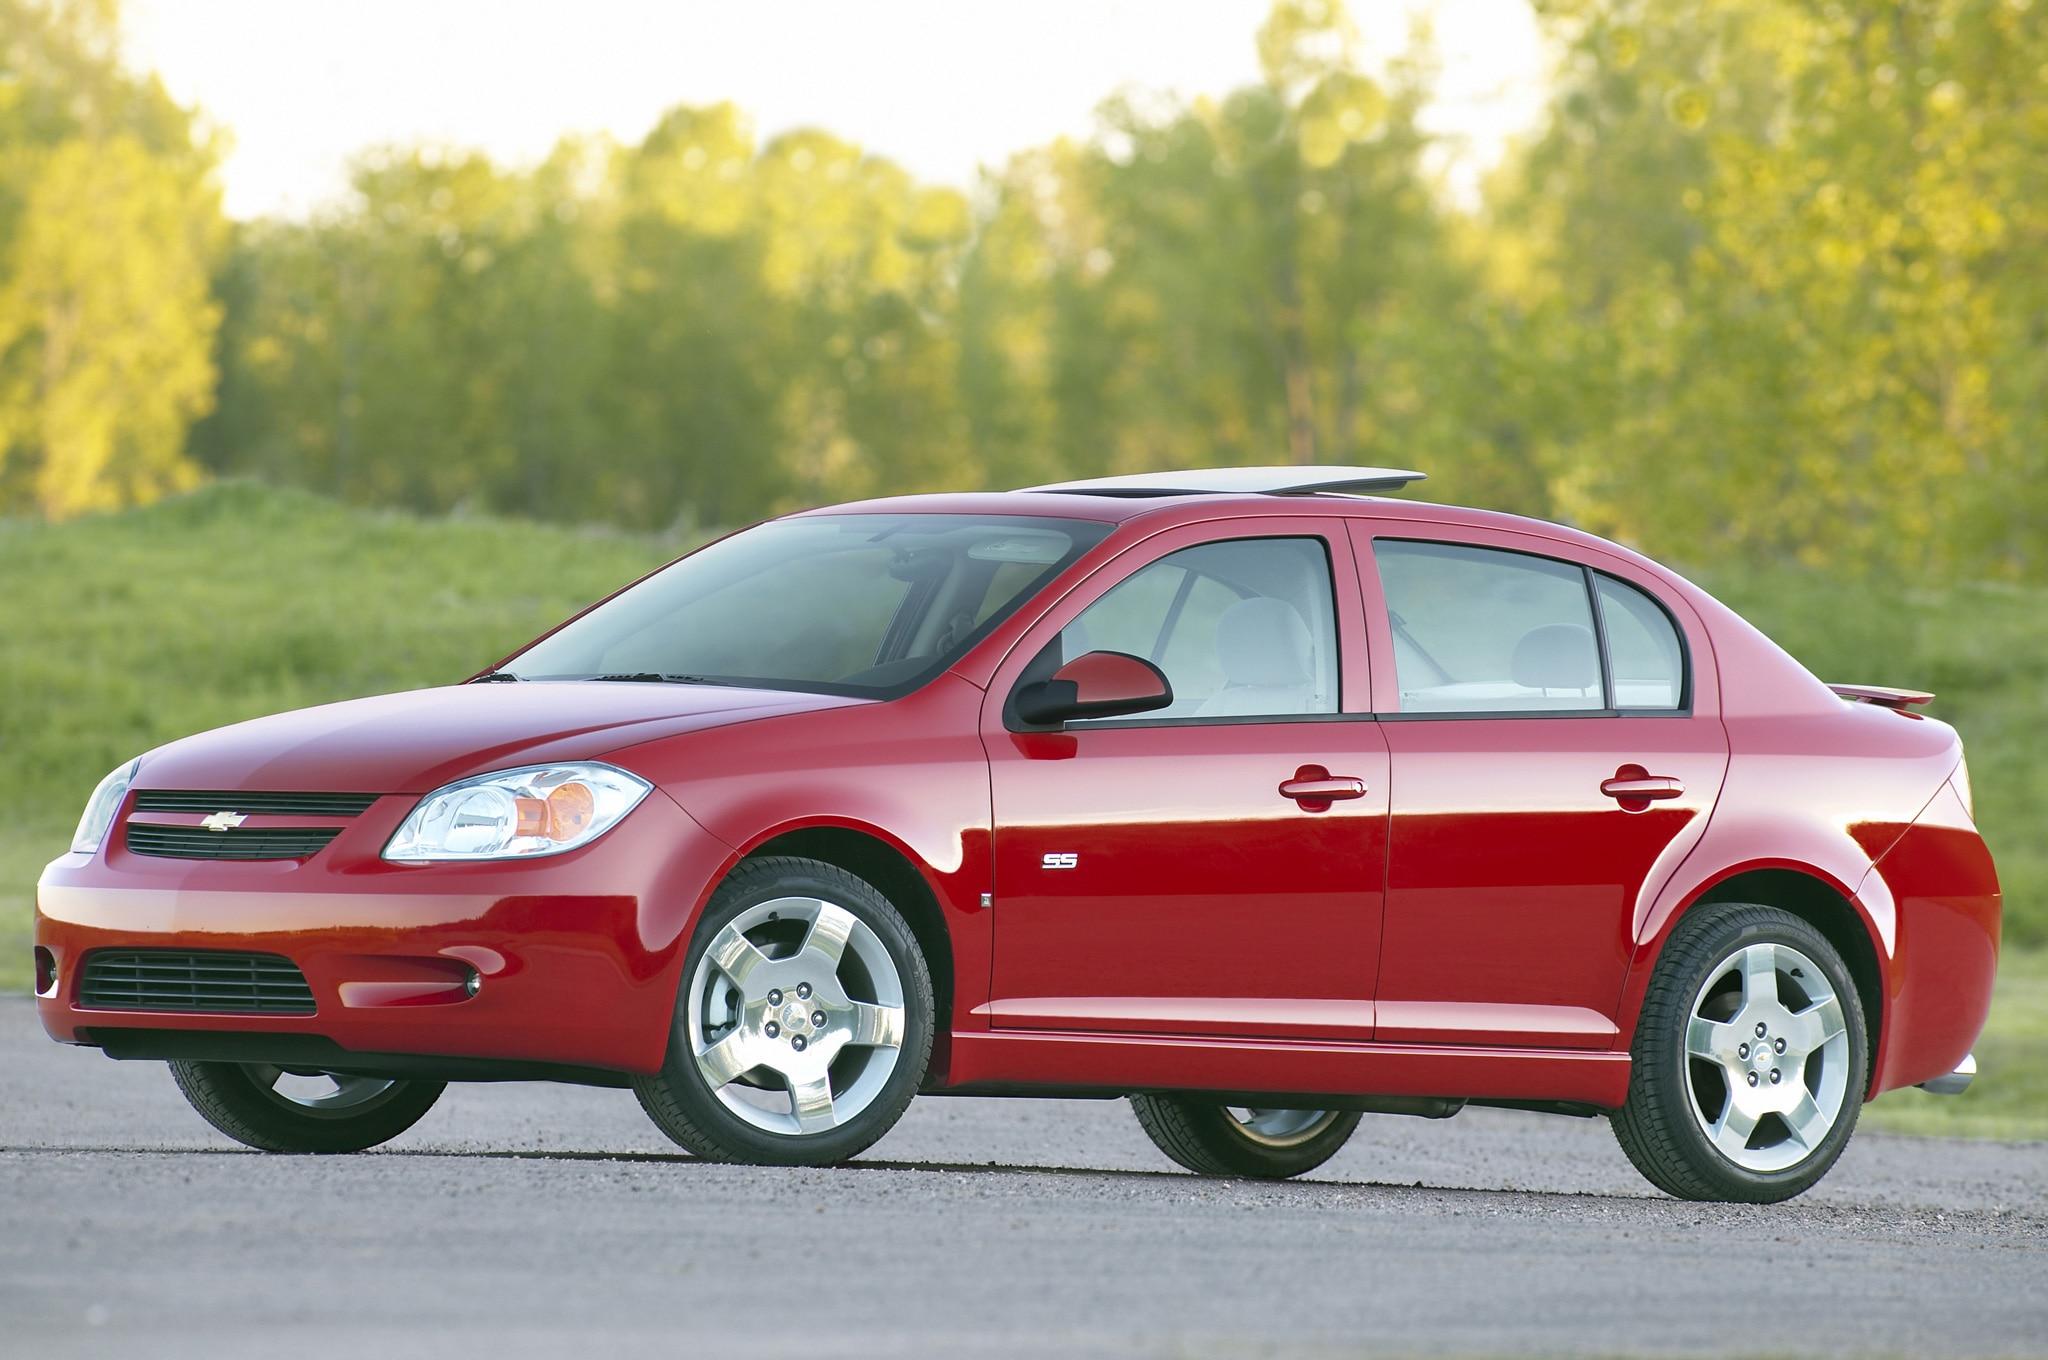 2007 Chevrolet Cobalt Sedan Front View3